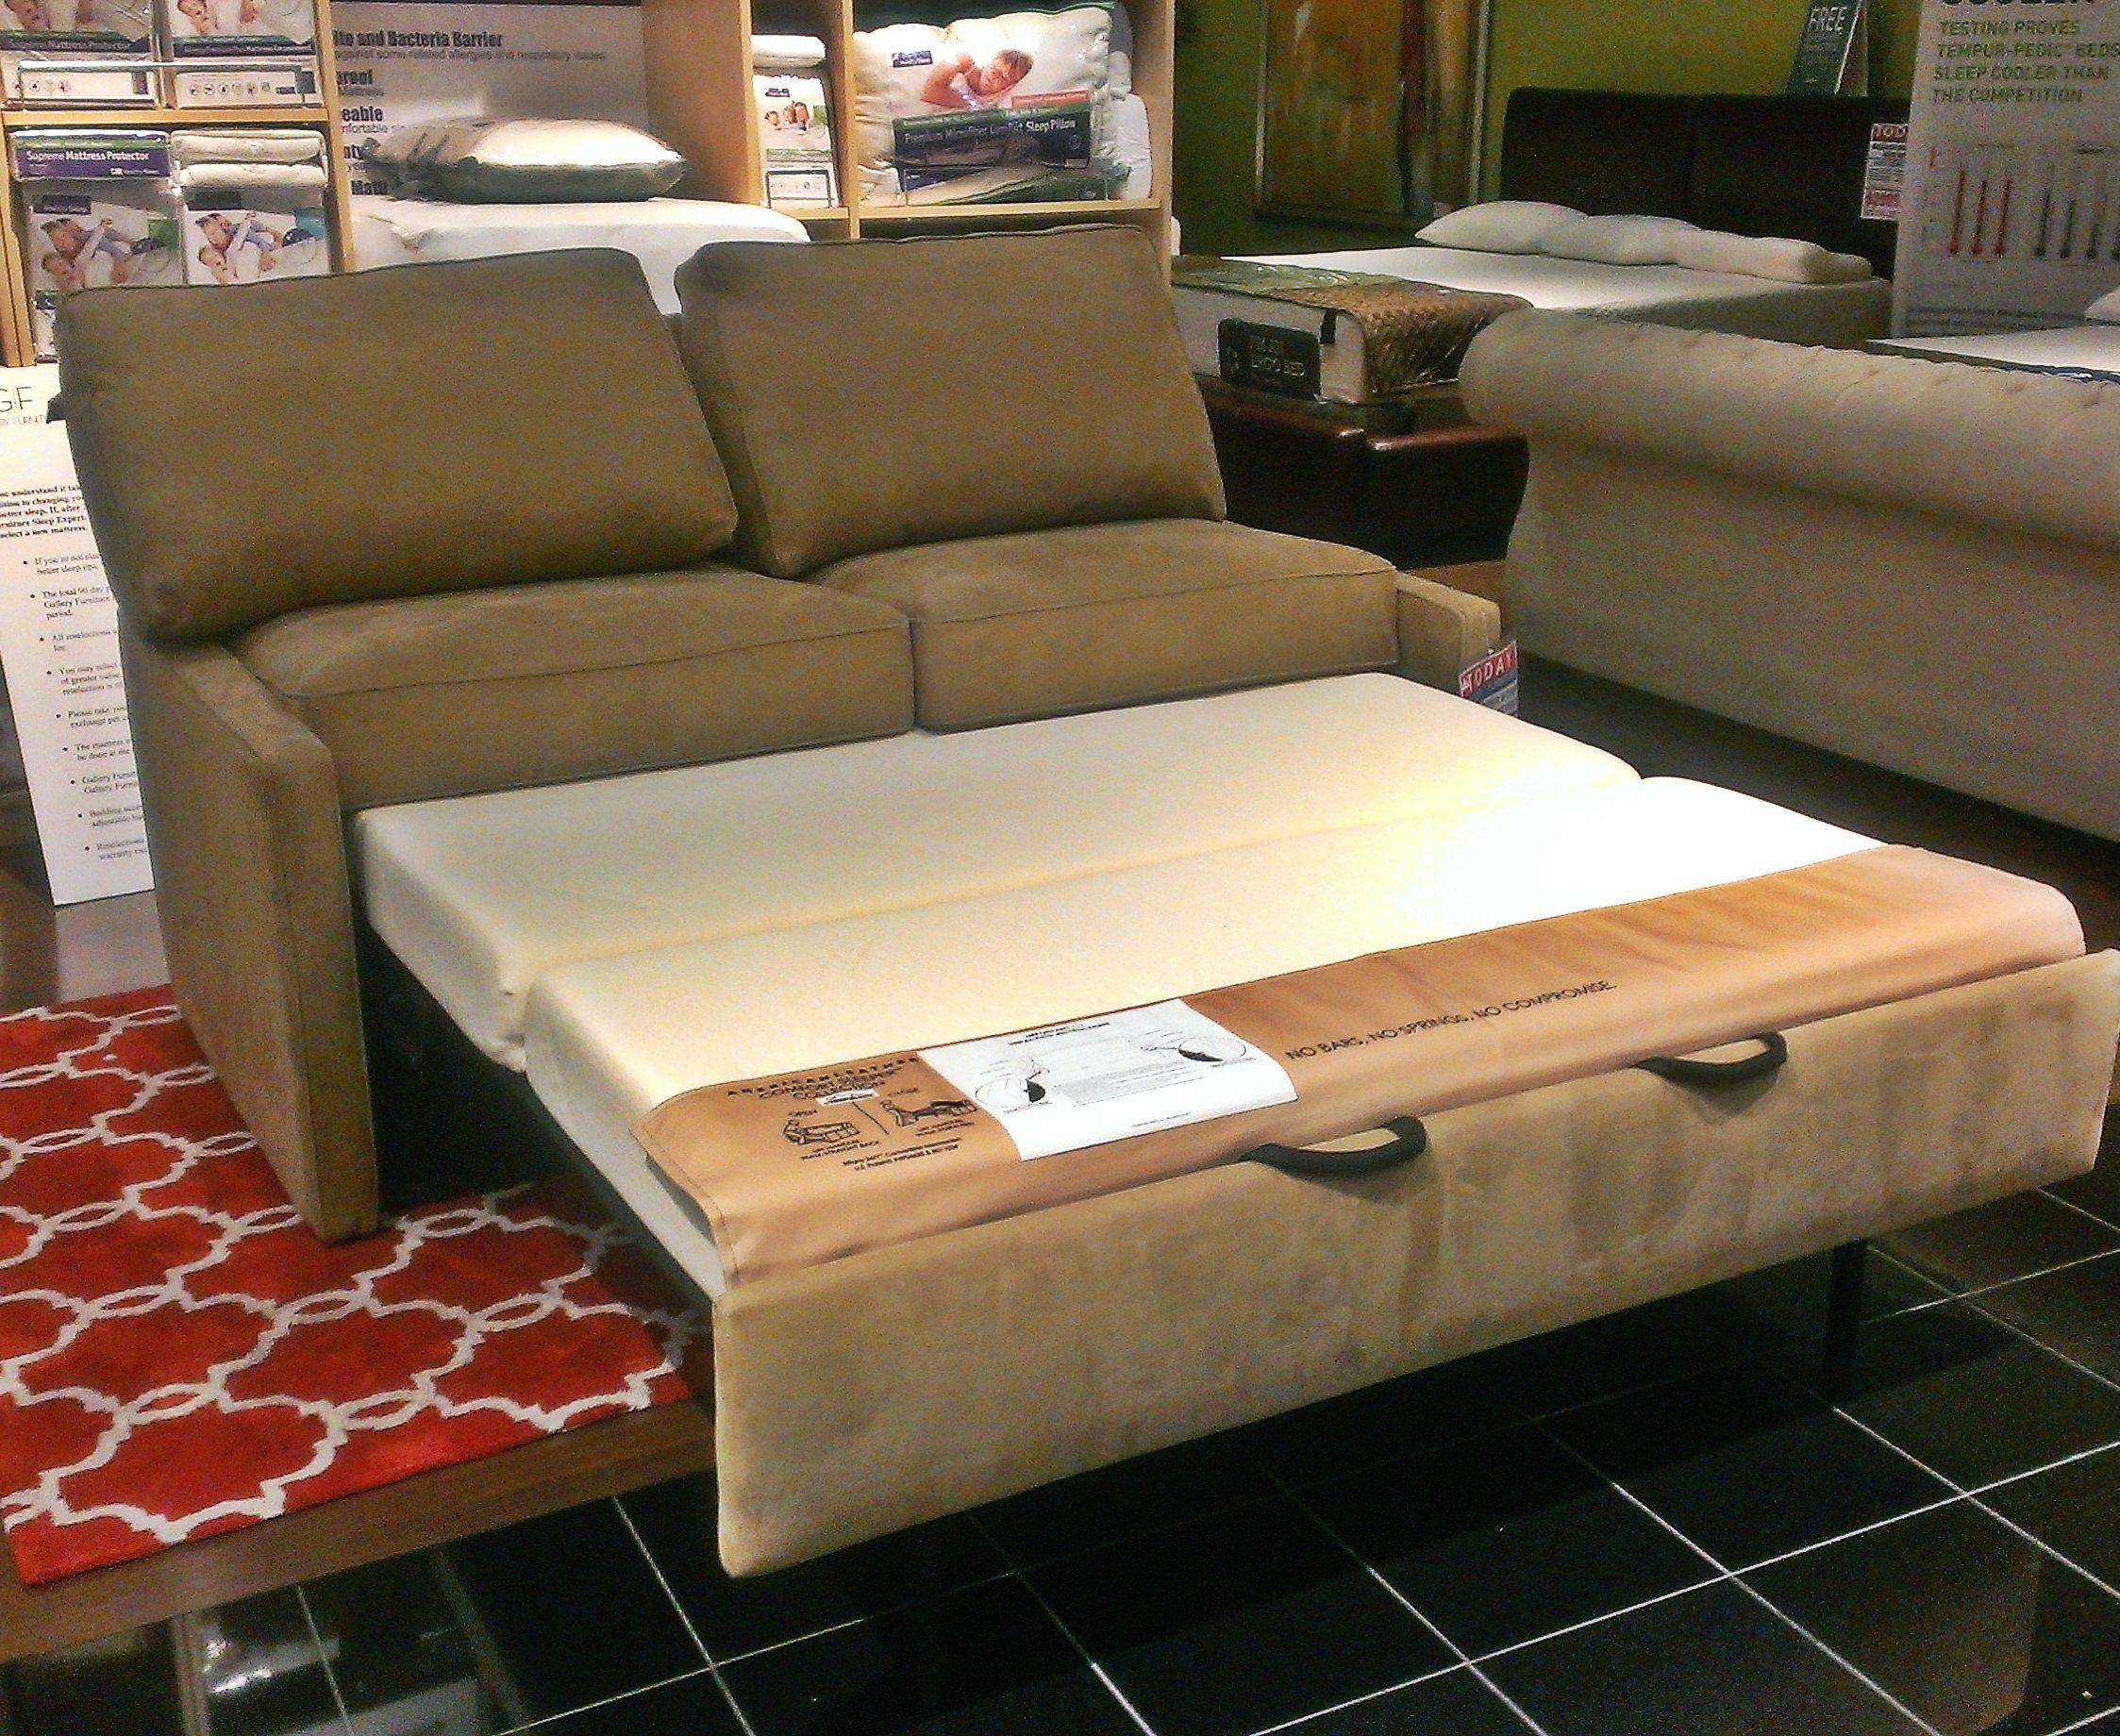 tempurpedic sleeper sofas charcoal sofa living room marvelous memory foam bed